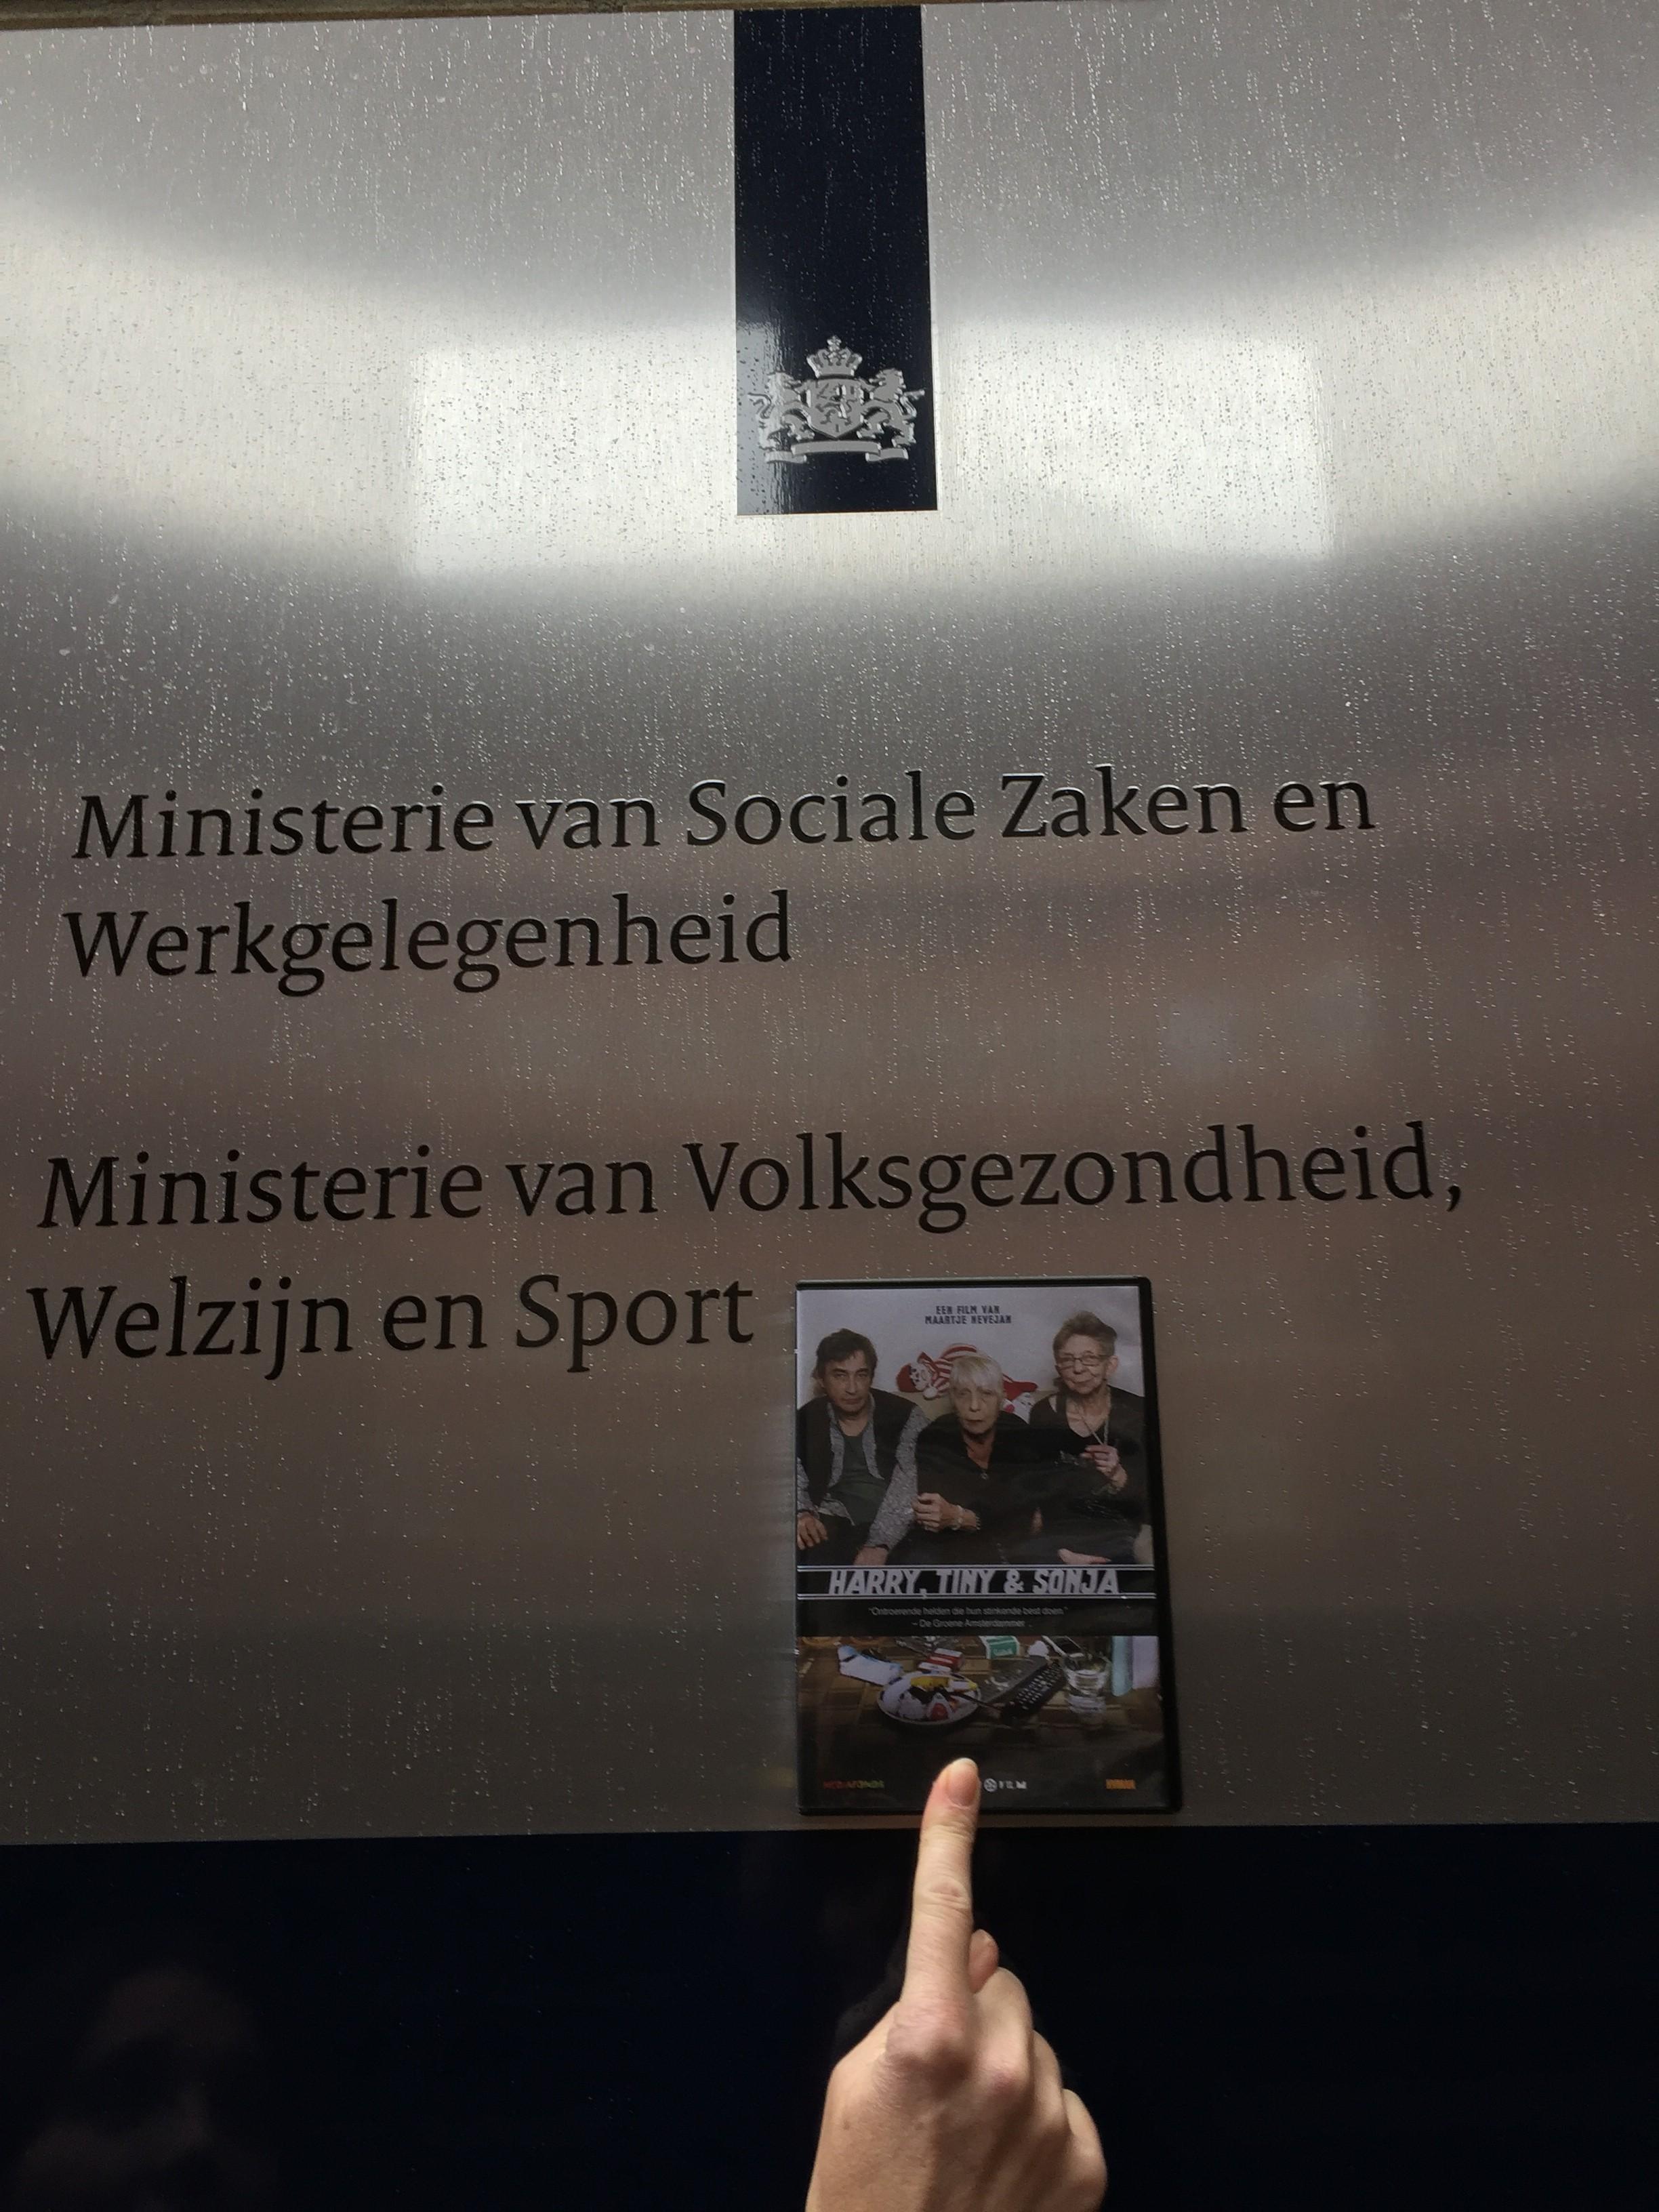 Screening at the Ministry of Health, of Nevejan's film ' Harry, Tiny en Sonja' bij WVC .